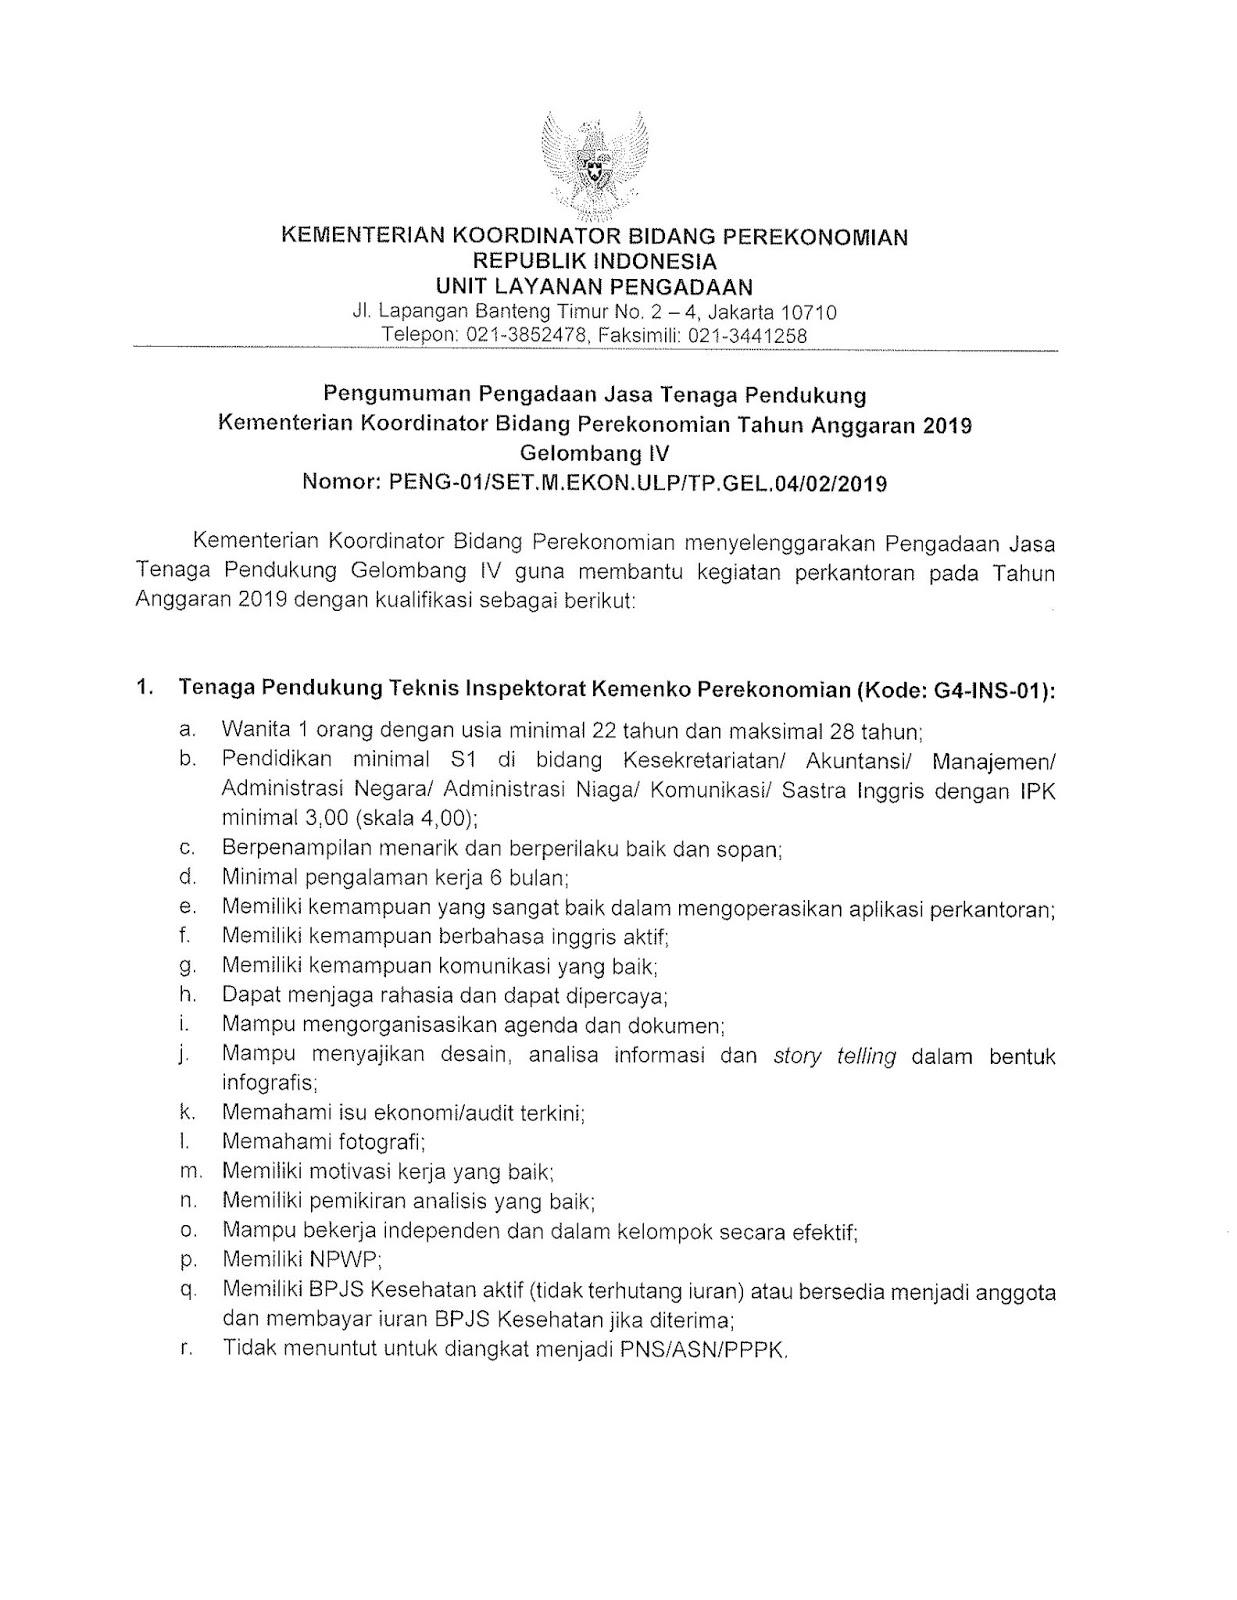 Lowongan Kerja Terbaru Kementerian Koordinator Bidang Perekonomian Februari 2019